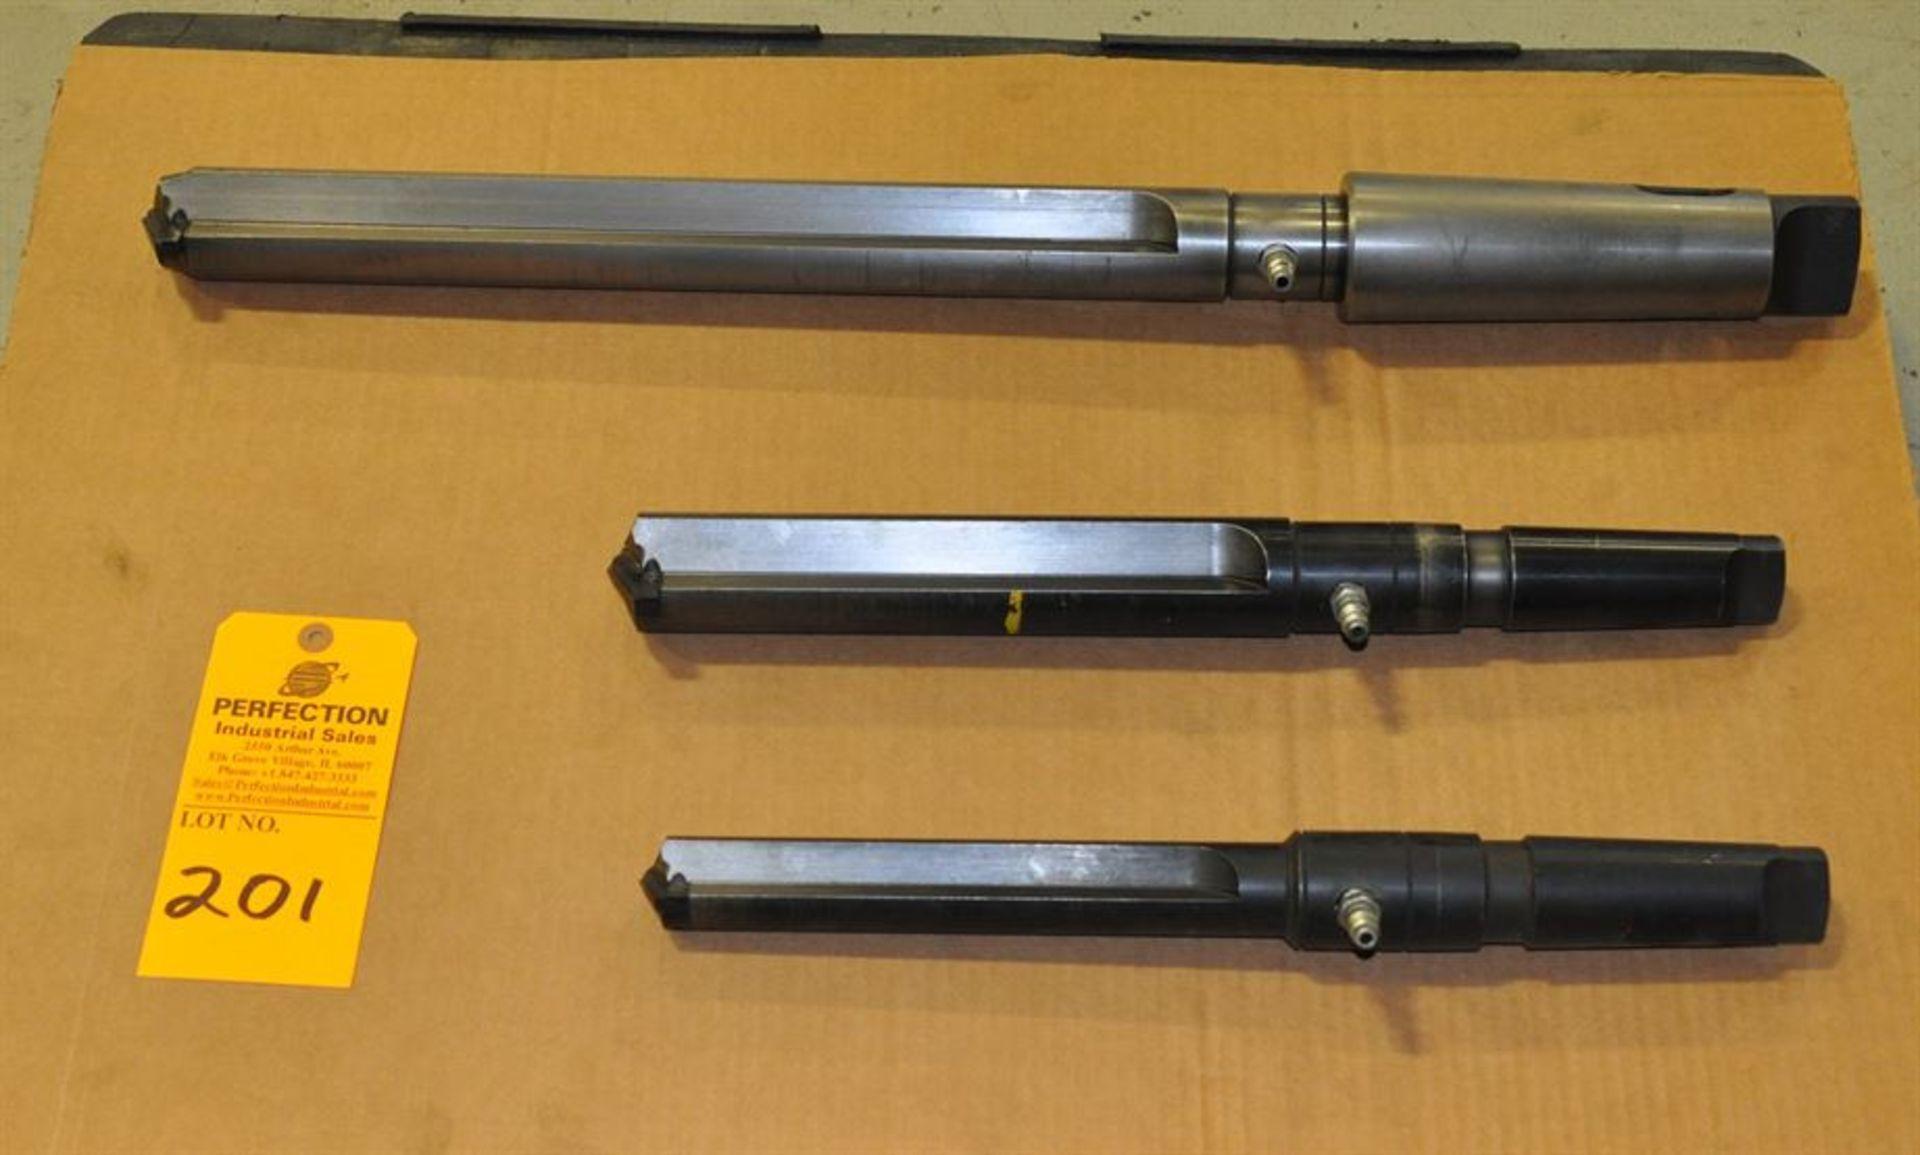 (3) Through Coolant 5 MT Spade Drills